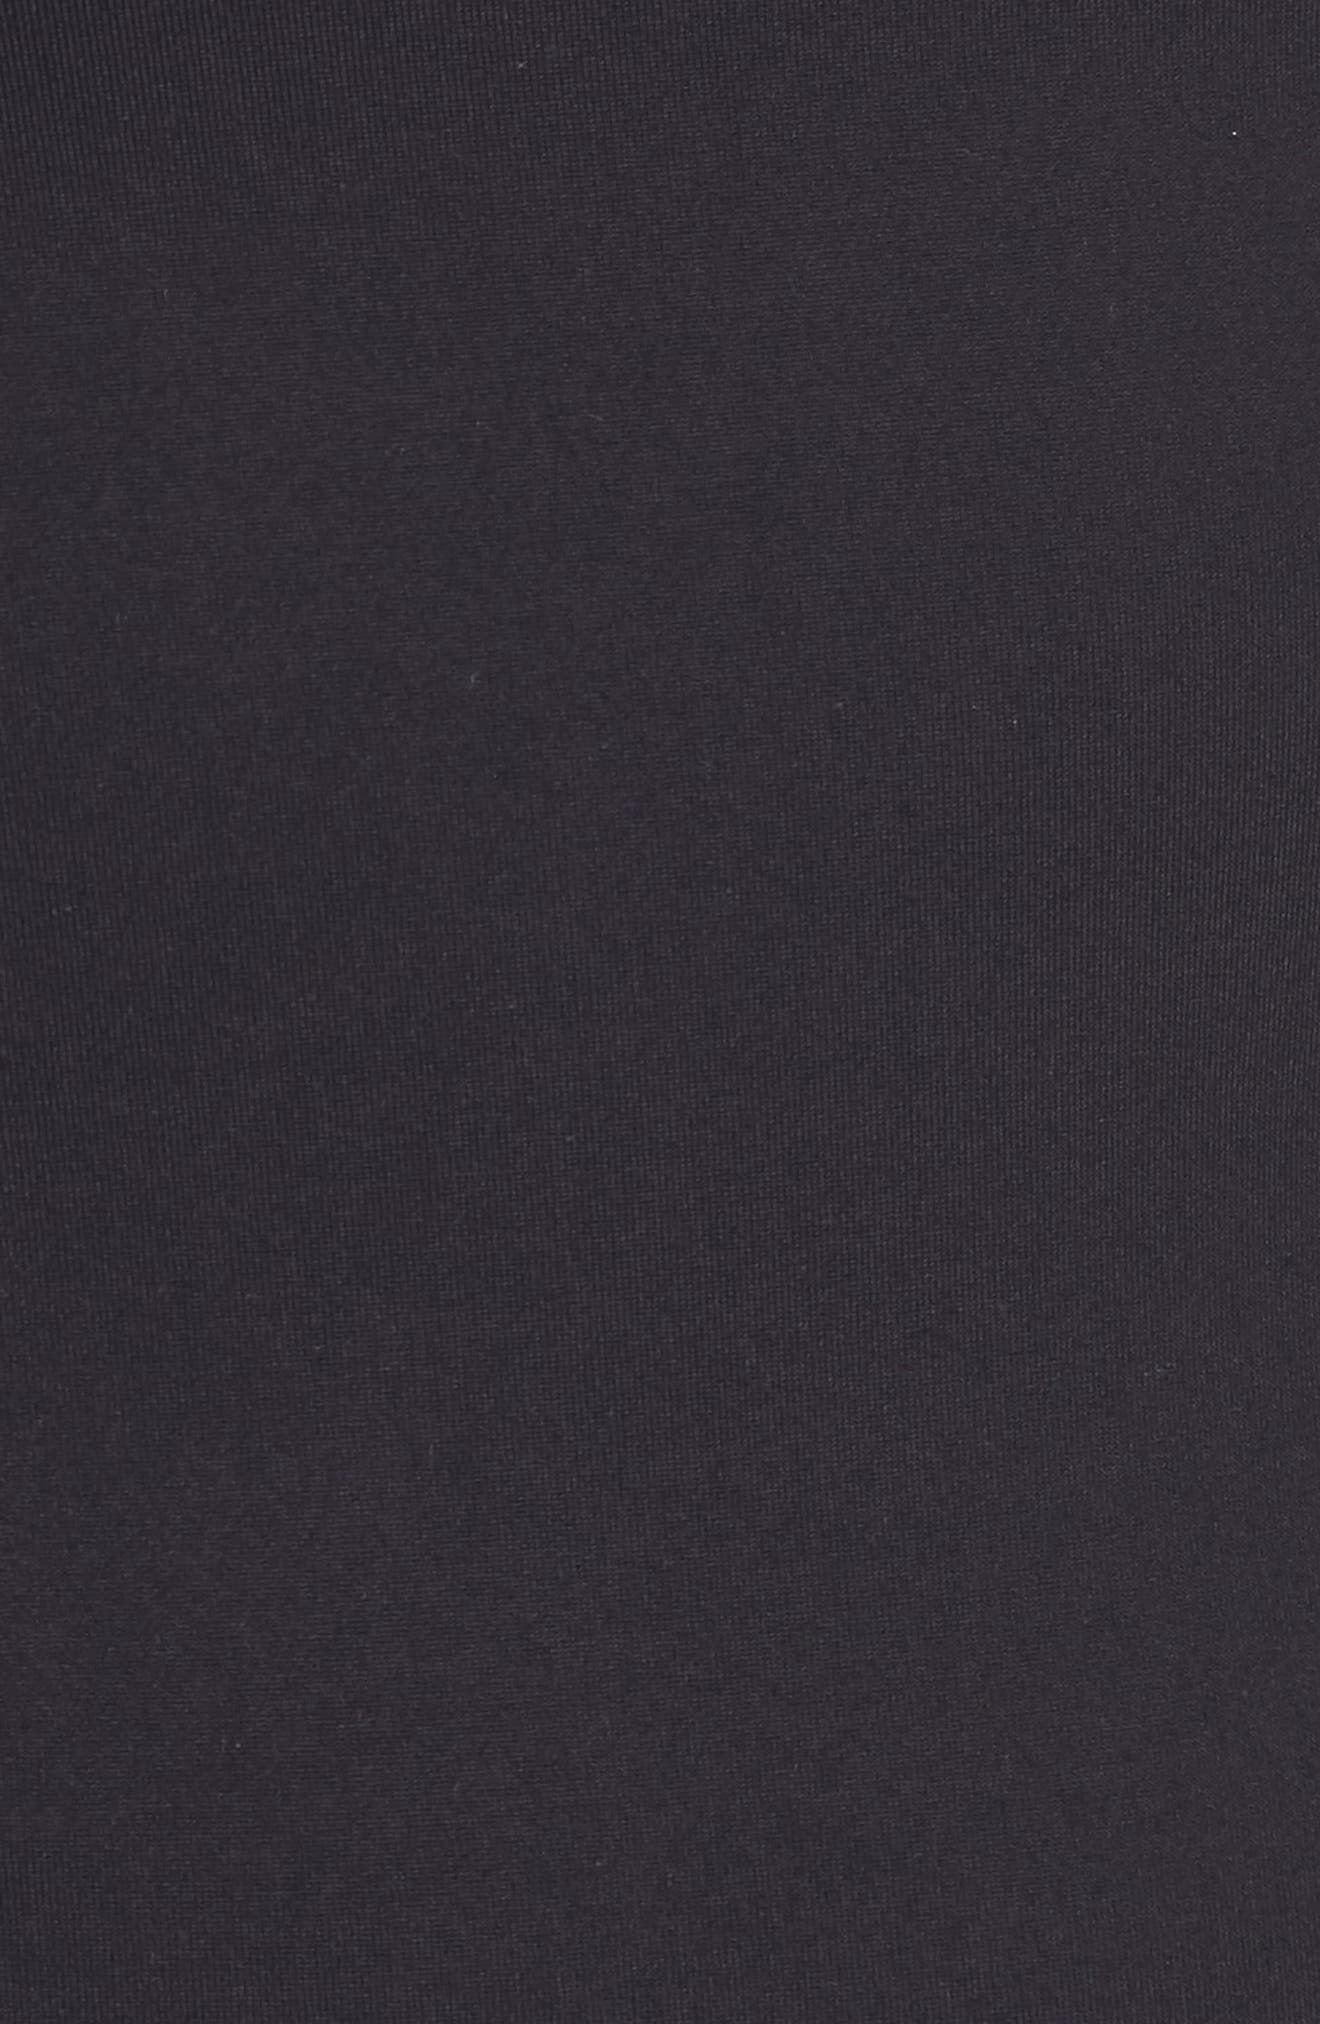 Body-Con Midi Dress,                             Alternate thumbnail 7, color,                             001